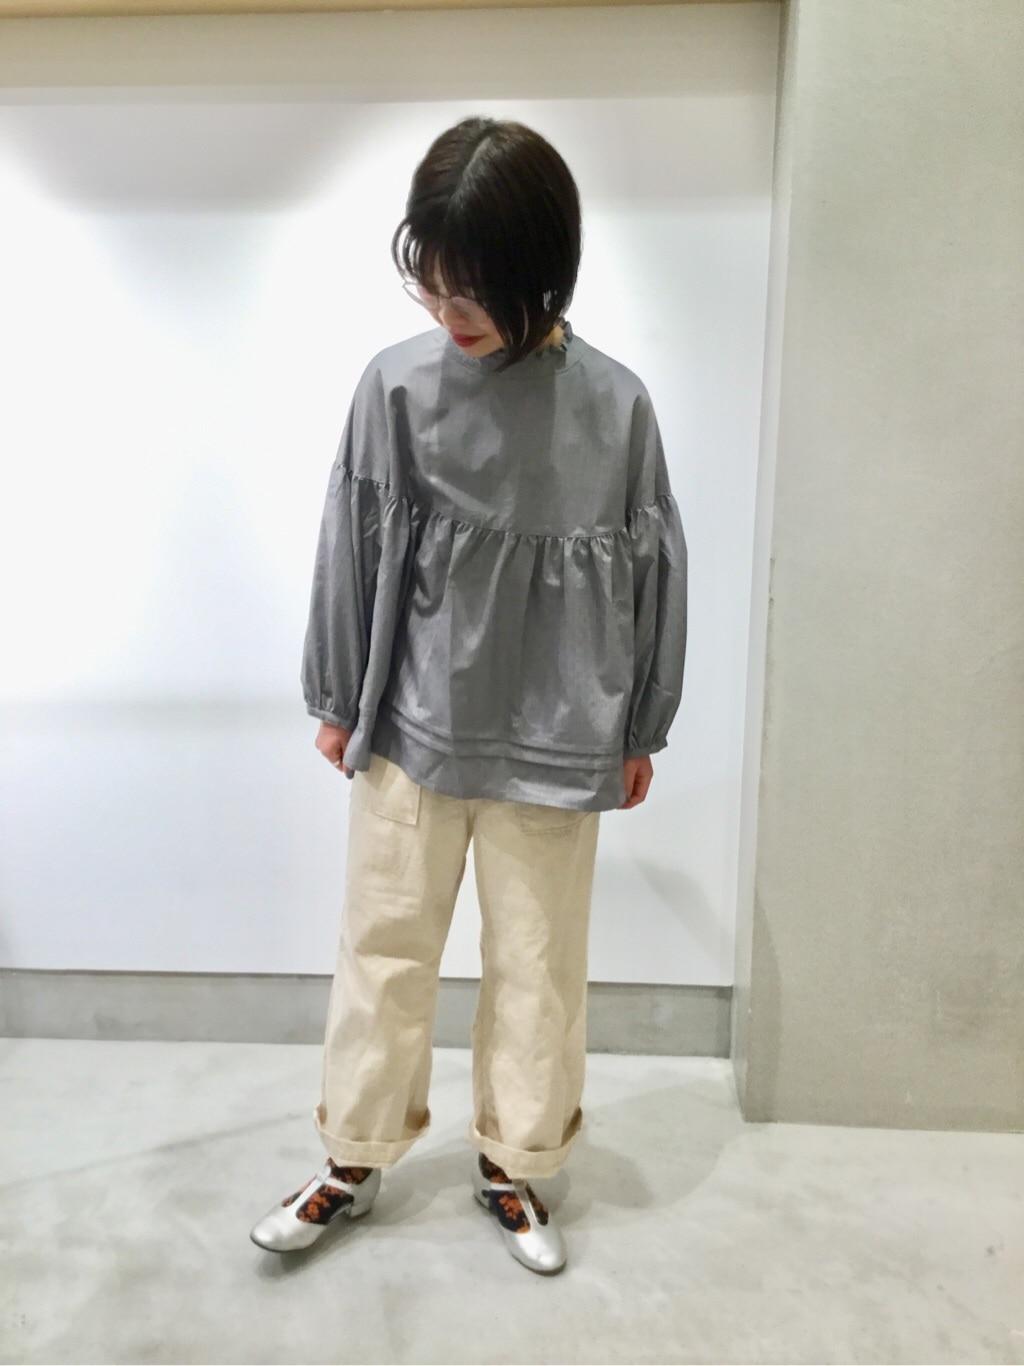 chambre de charme 横浜ジョイナス 身長:153cm 2020.01.20